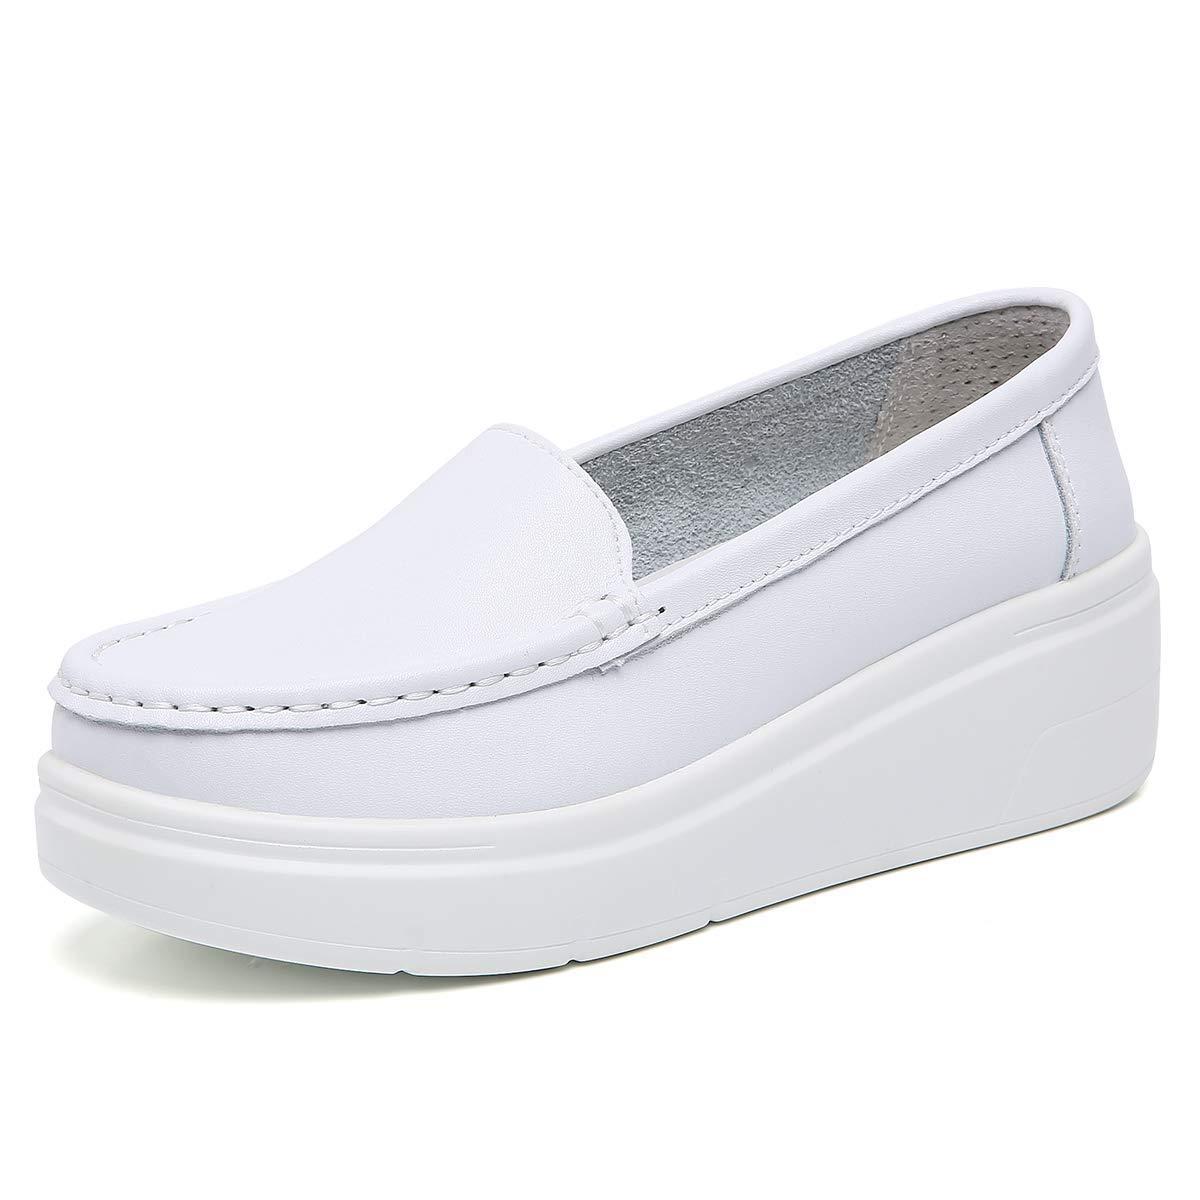 ZOVE Women's Lightweight Nursing Shoes Comfort Platform Food Service Shoe Restaurant Work Slip On Leather Loafers